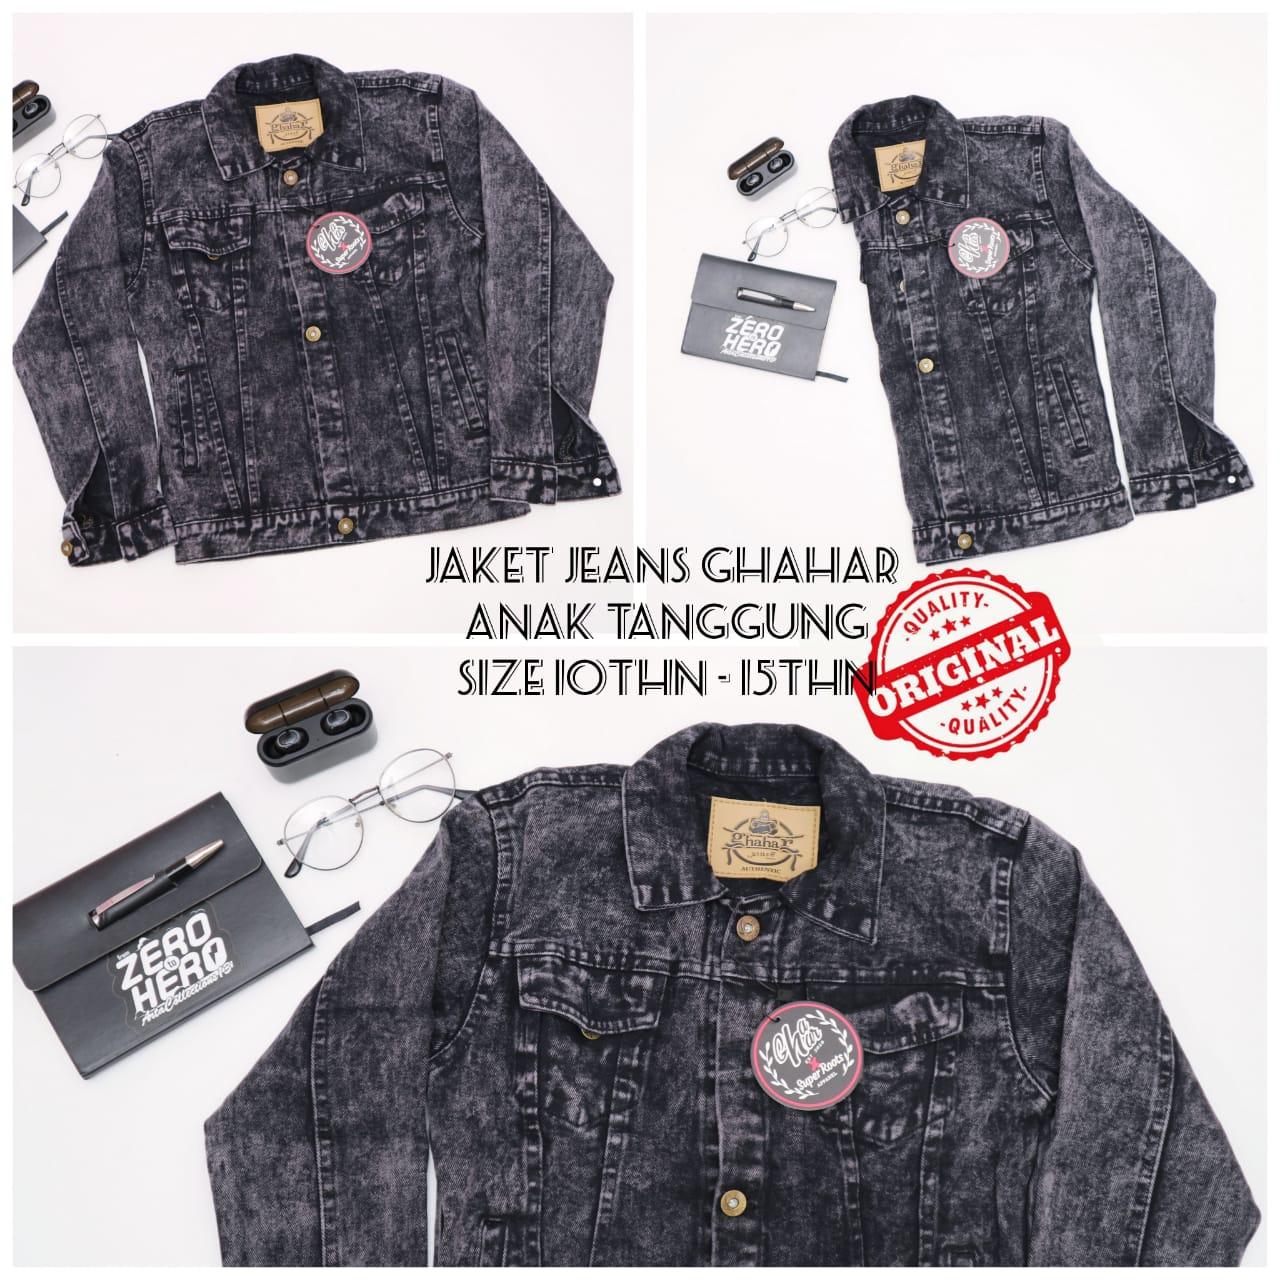 art -jaket jeans anak pria umur 10thn-15thn / jaket jeans sandwash ghahar anak tanggung